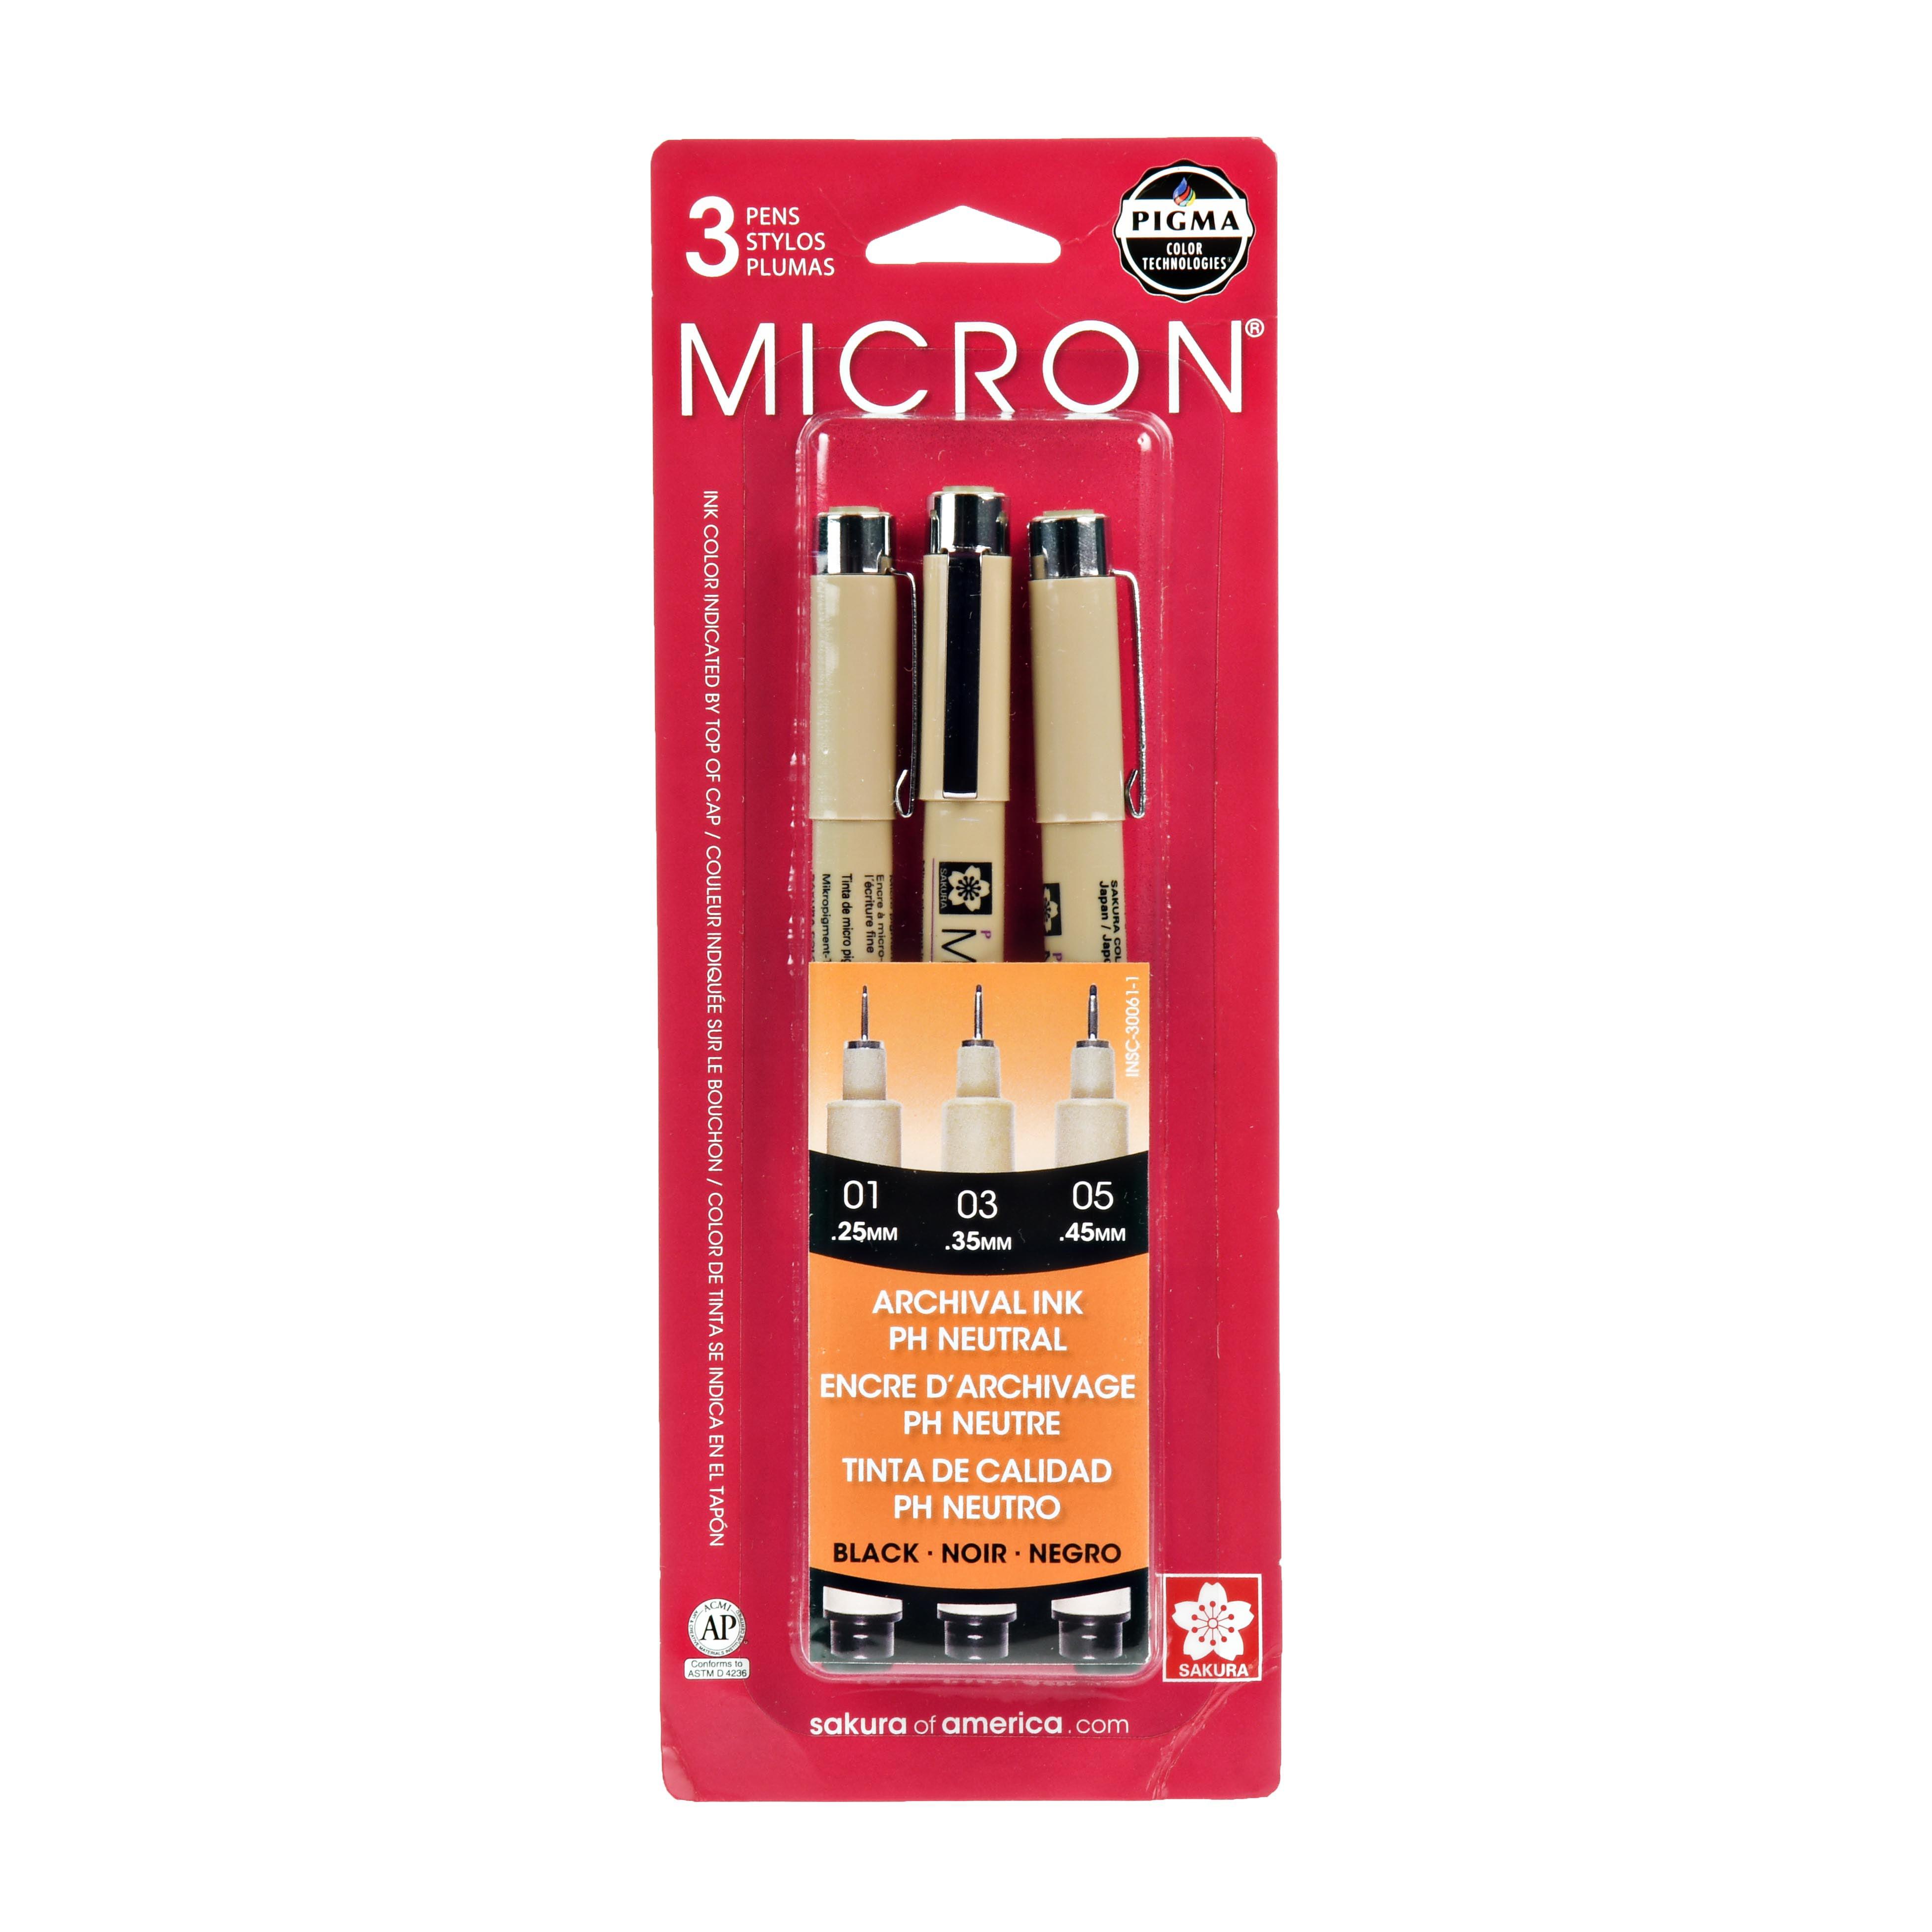 Pack of 3 Brown Sakura Pigma Micron 0.1mm Pigment Fineliners